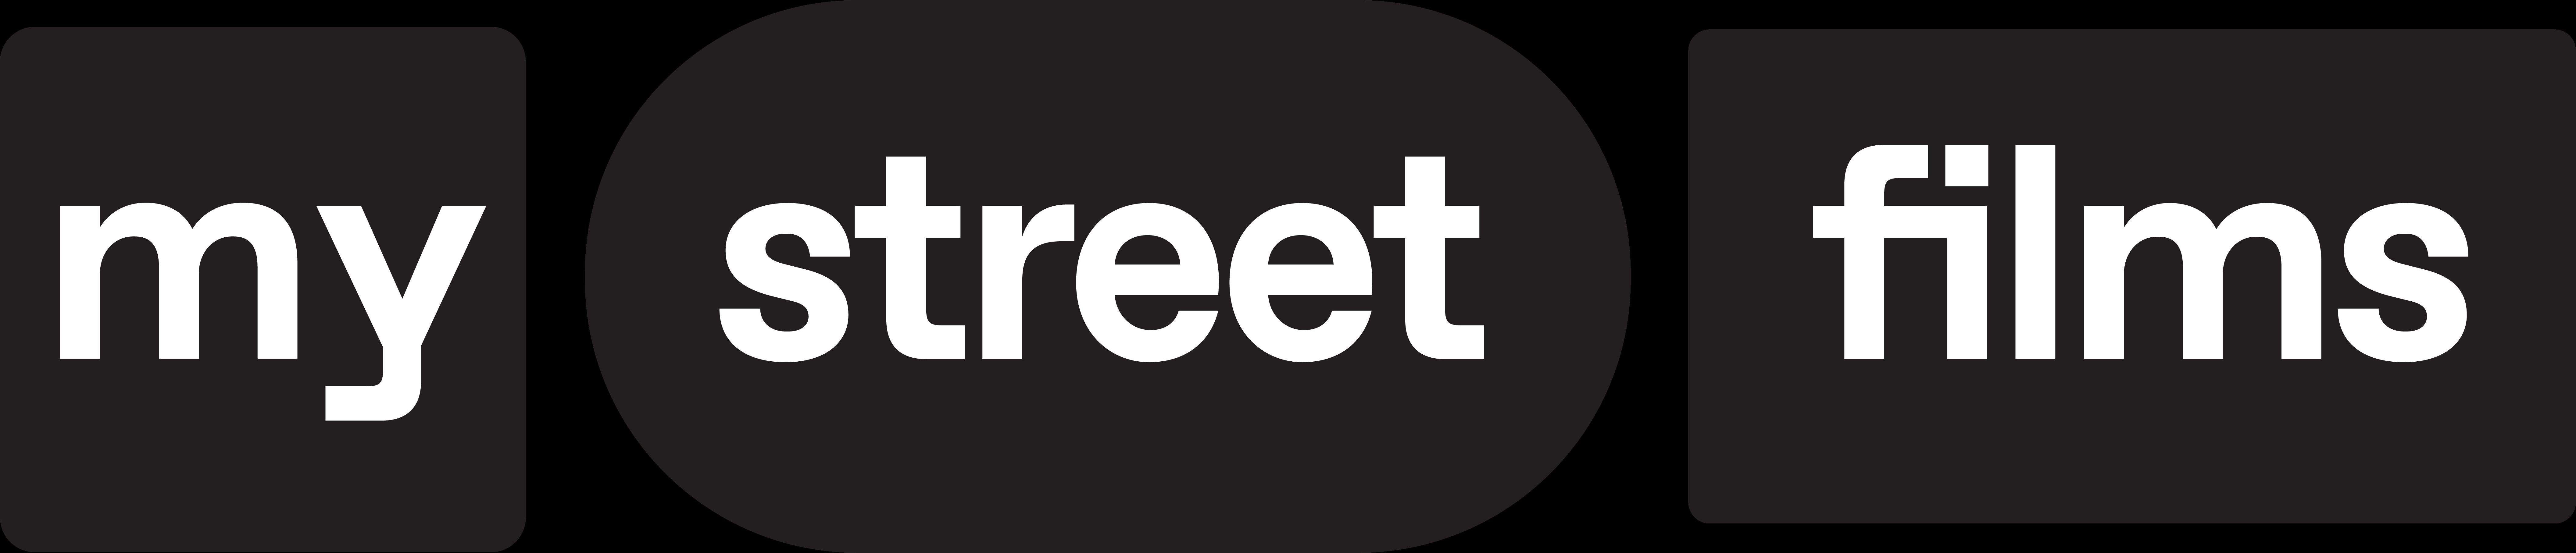 My Street Films